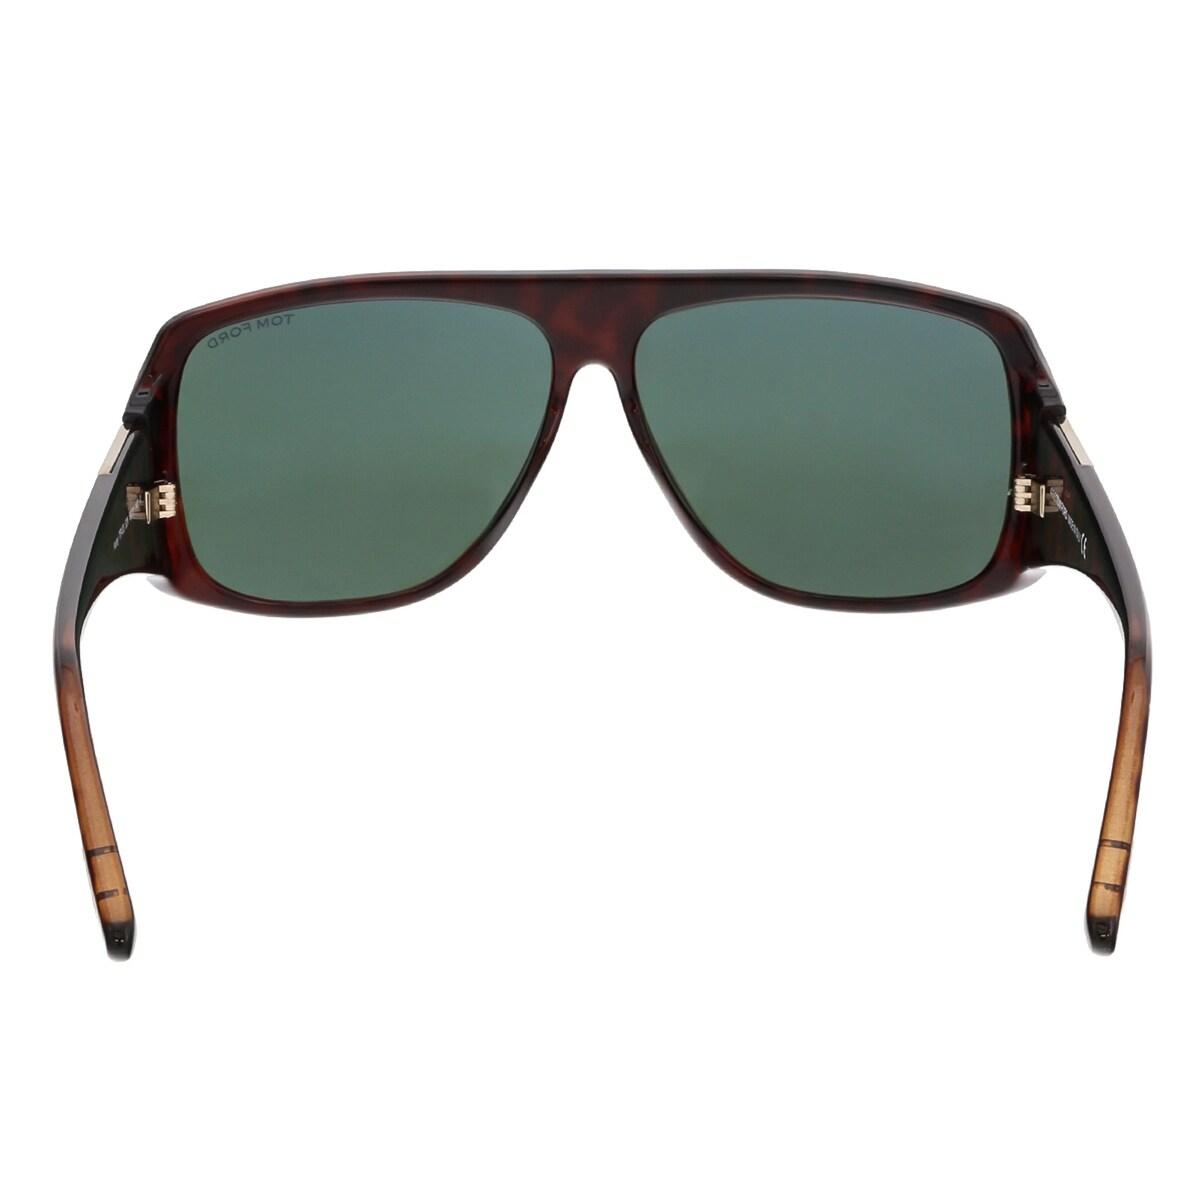 3ecb83db7e4ac Shop Tom Ford FT0433 52N HARLEY Dark Havana Rectangular Sunglasses -  60-11-140 - Ships To Canada - Overstock - 15371937